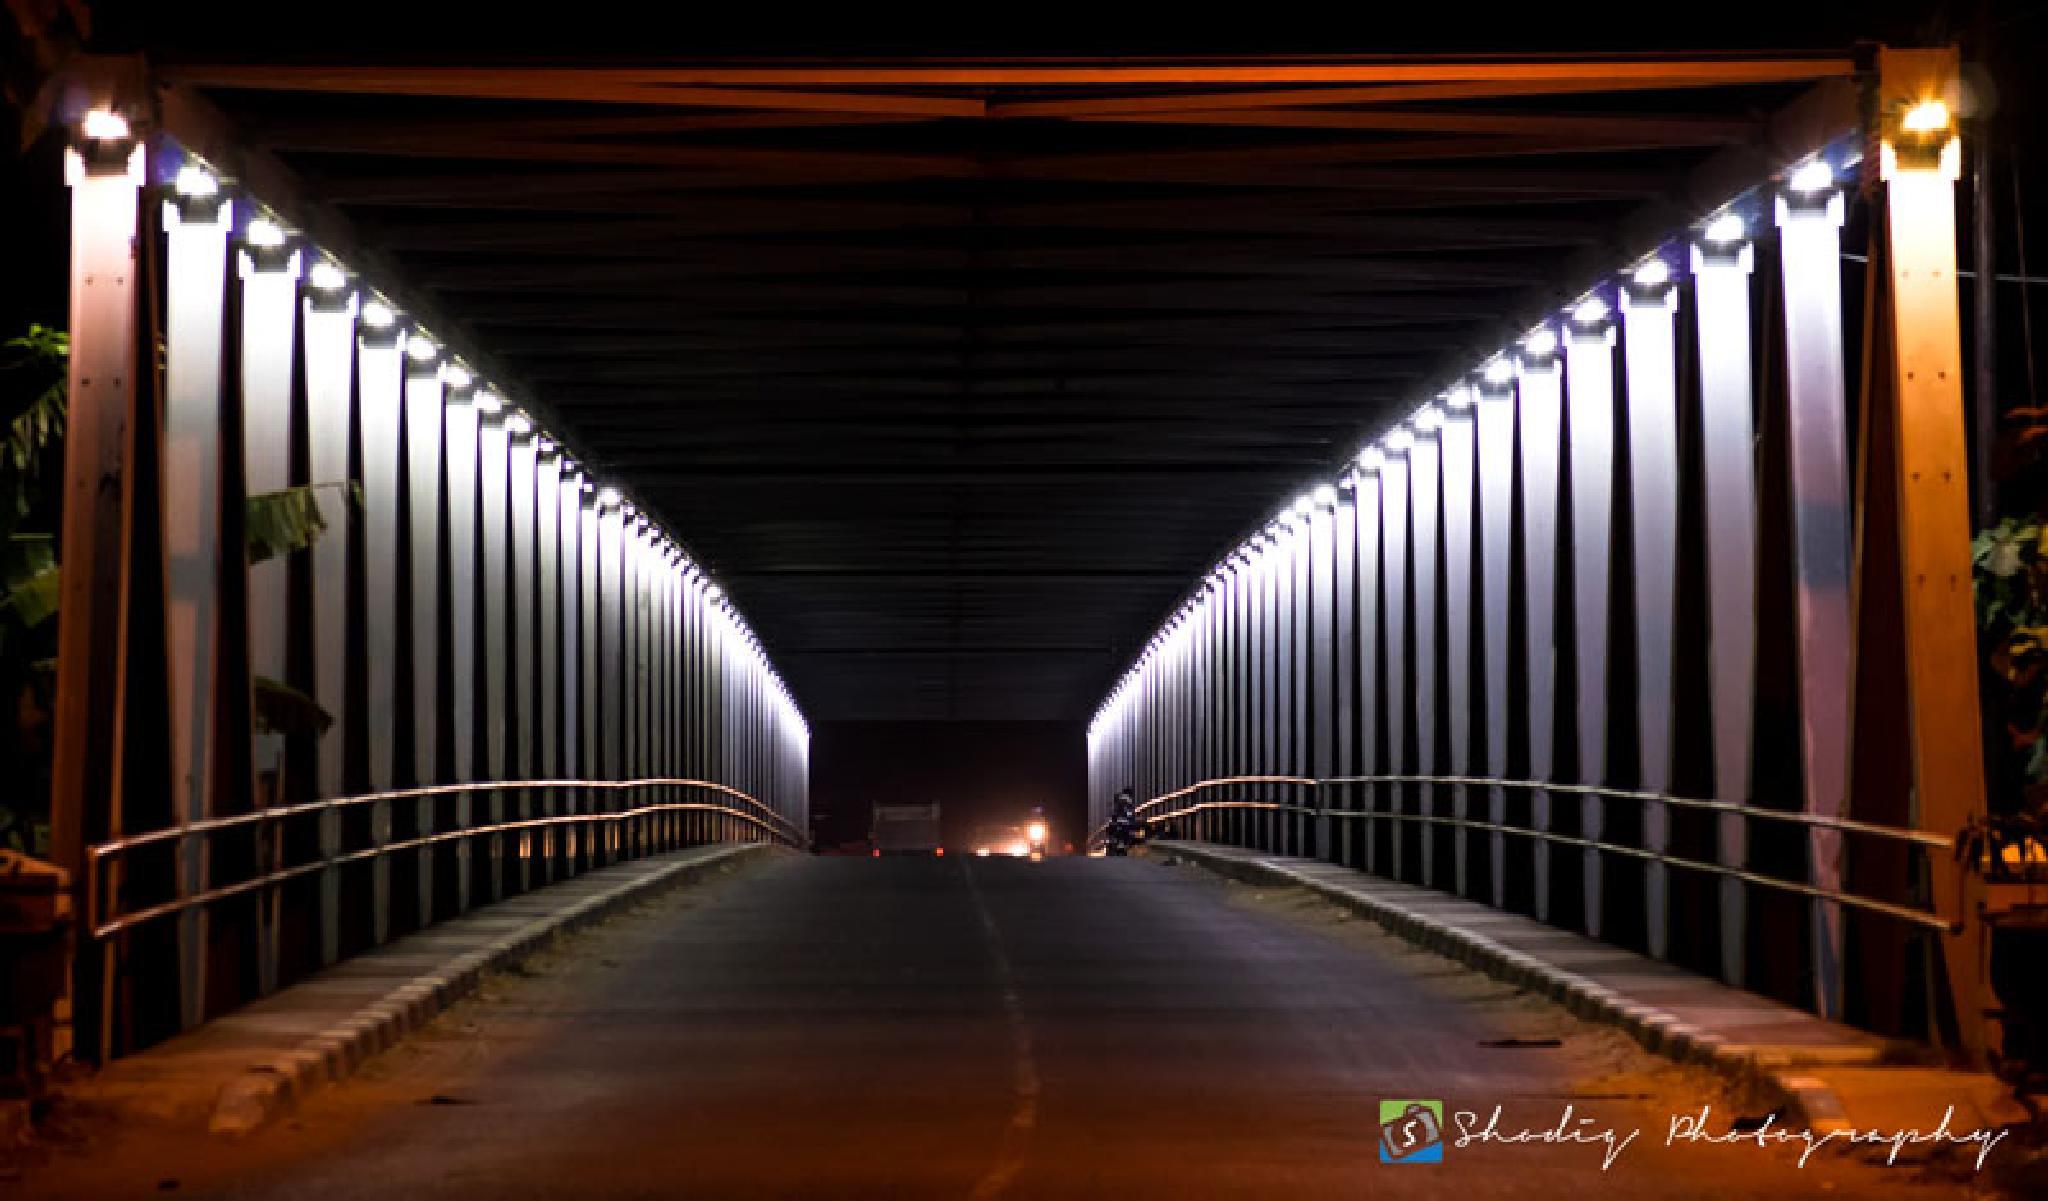 a night bridge by shodiq